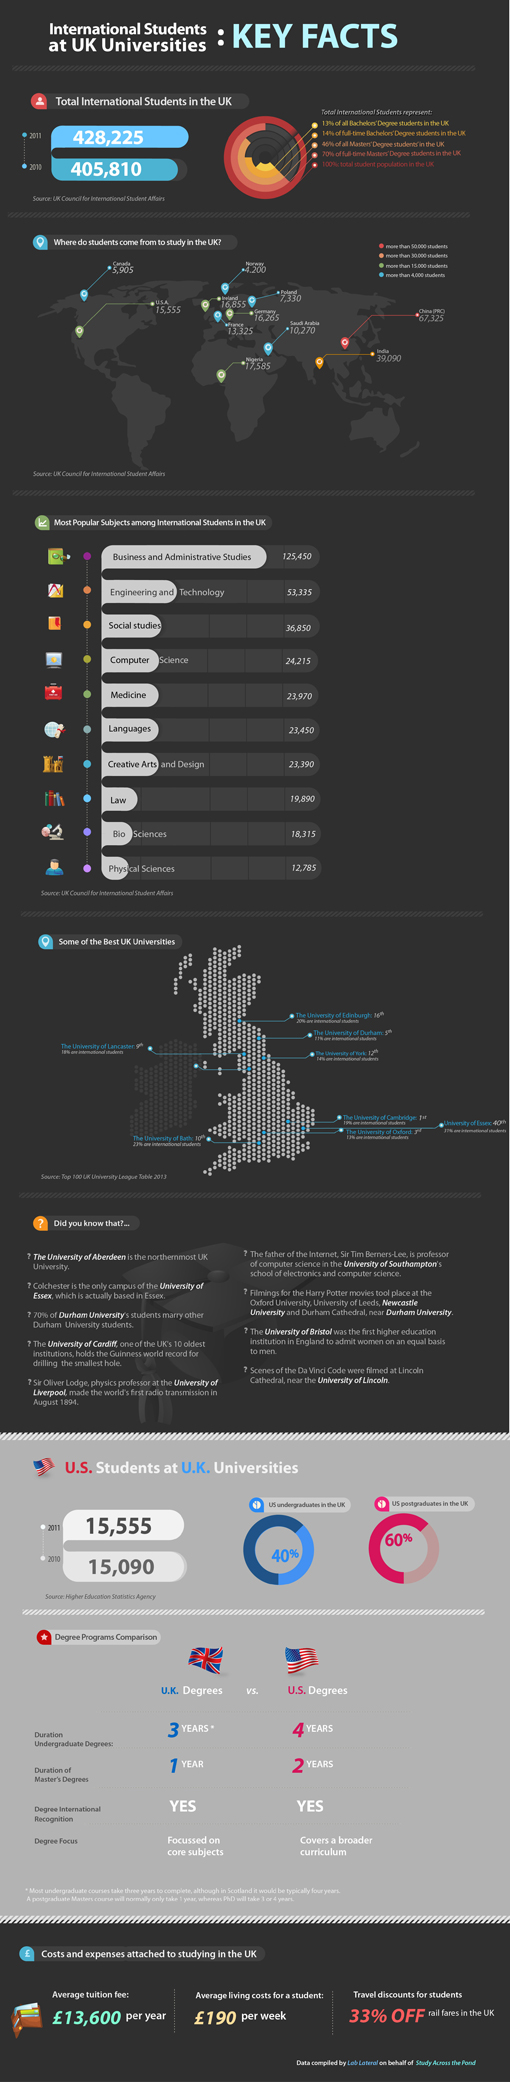 International Students at UK Universities: Key Facts